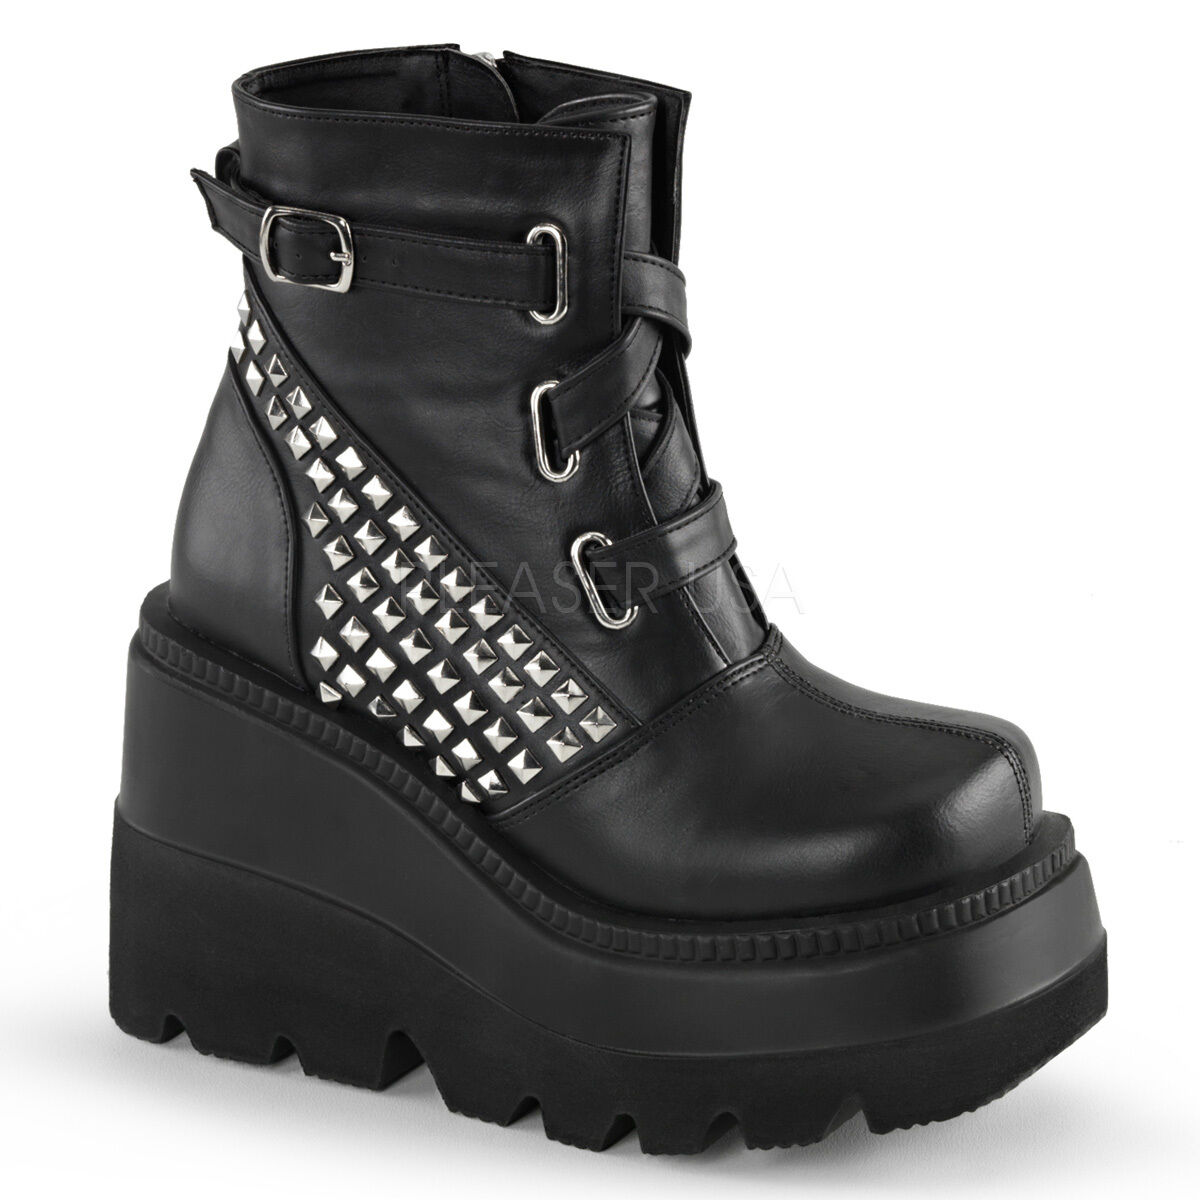 DEMONIA SHA50 SHA50 SHA50 BVL Black Gothic Punk 4 1 2  Wedge Platform Studded Ankle Boots 758f09